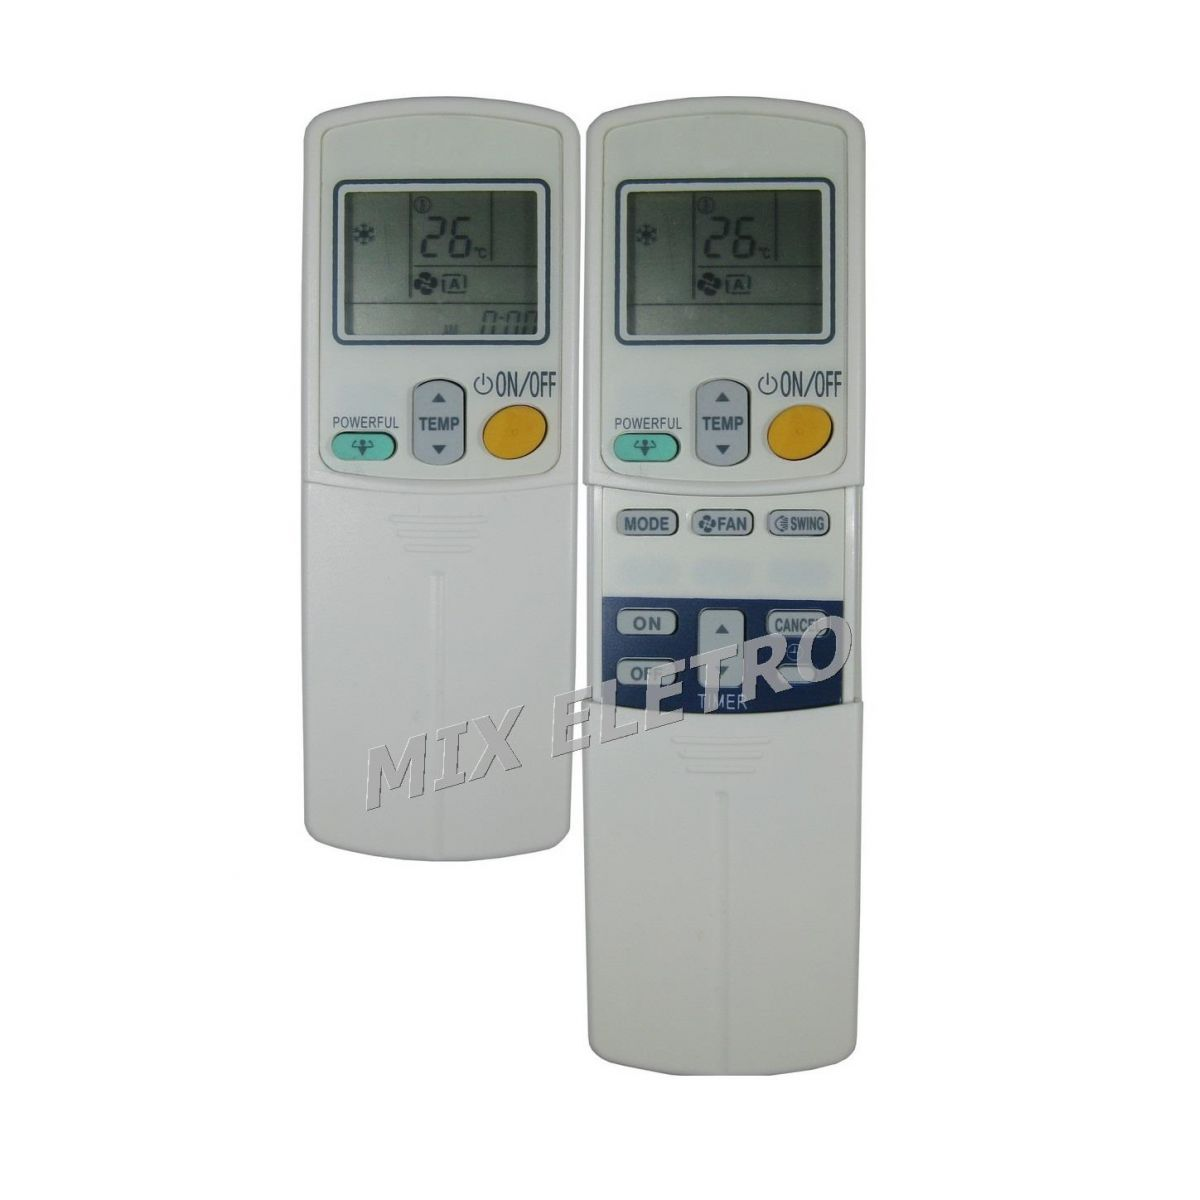 Controle Remoto para Ar Condicionado Split Daikin ARC423A17  - Mix Eletro